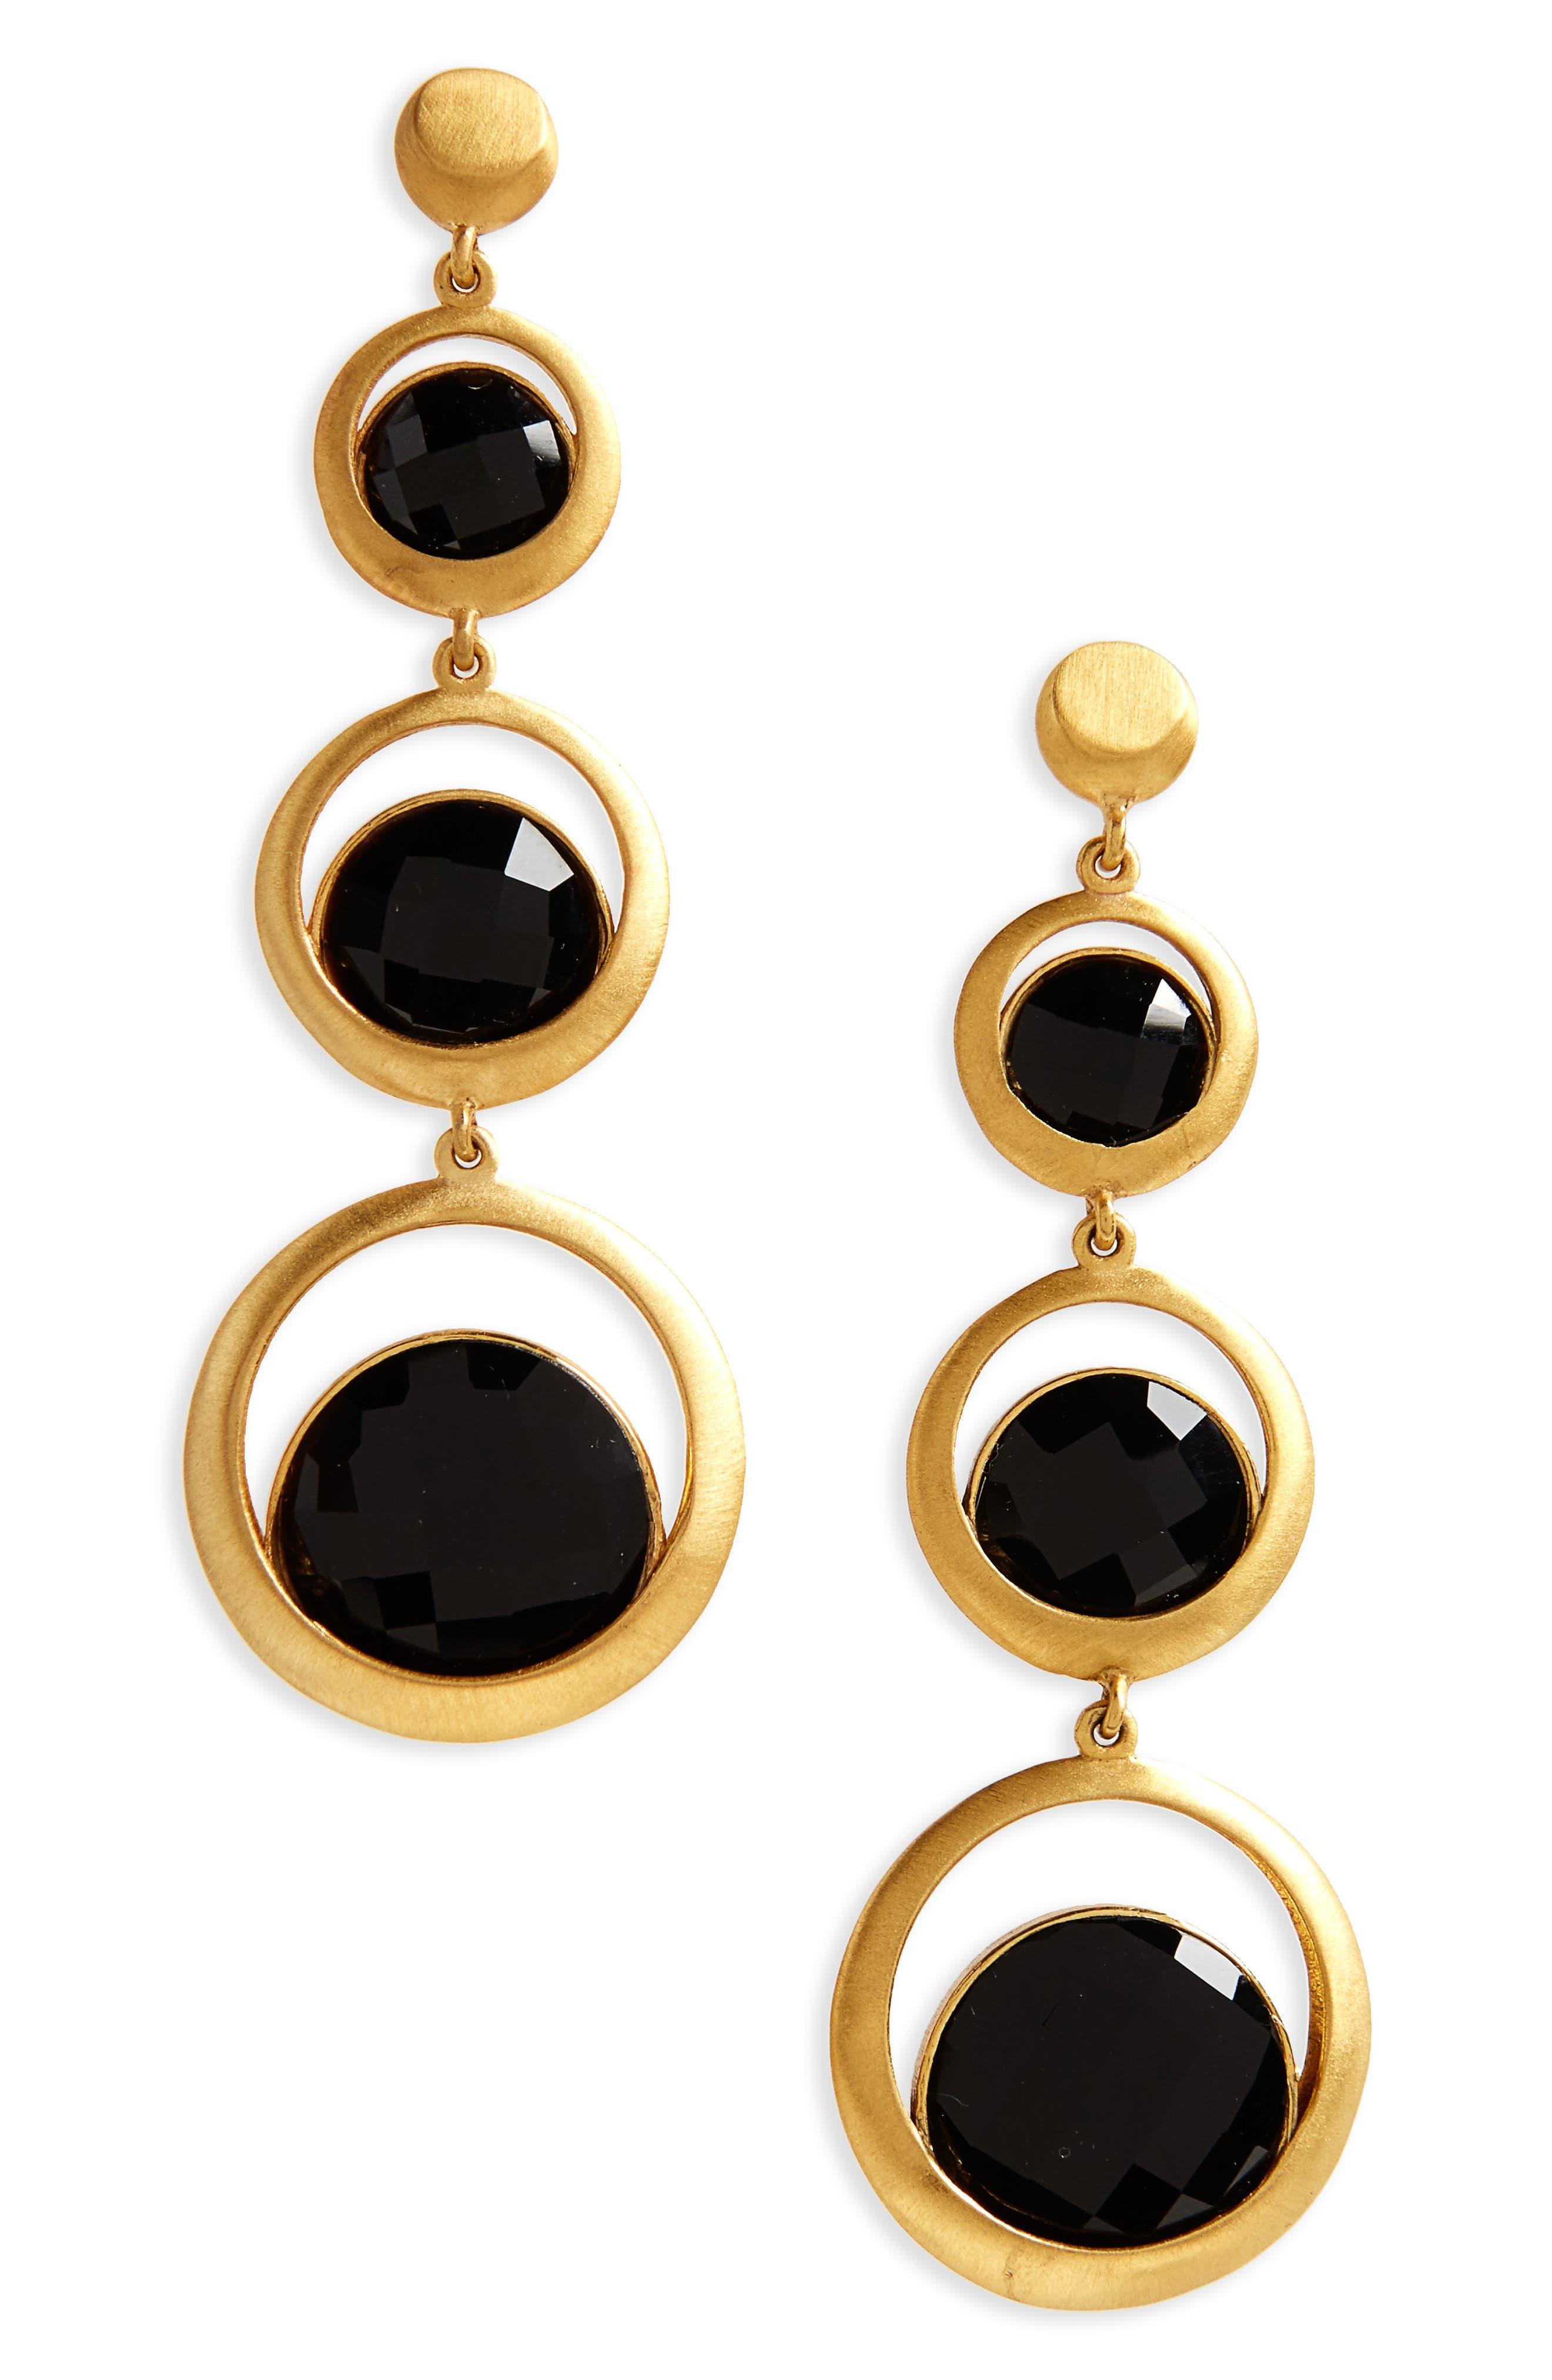 Triple Semiprecious Stone Drop Earrings,                         Main,                         color, Black Onyx/ Gold